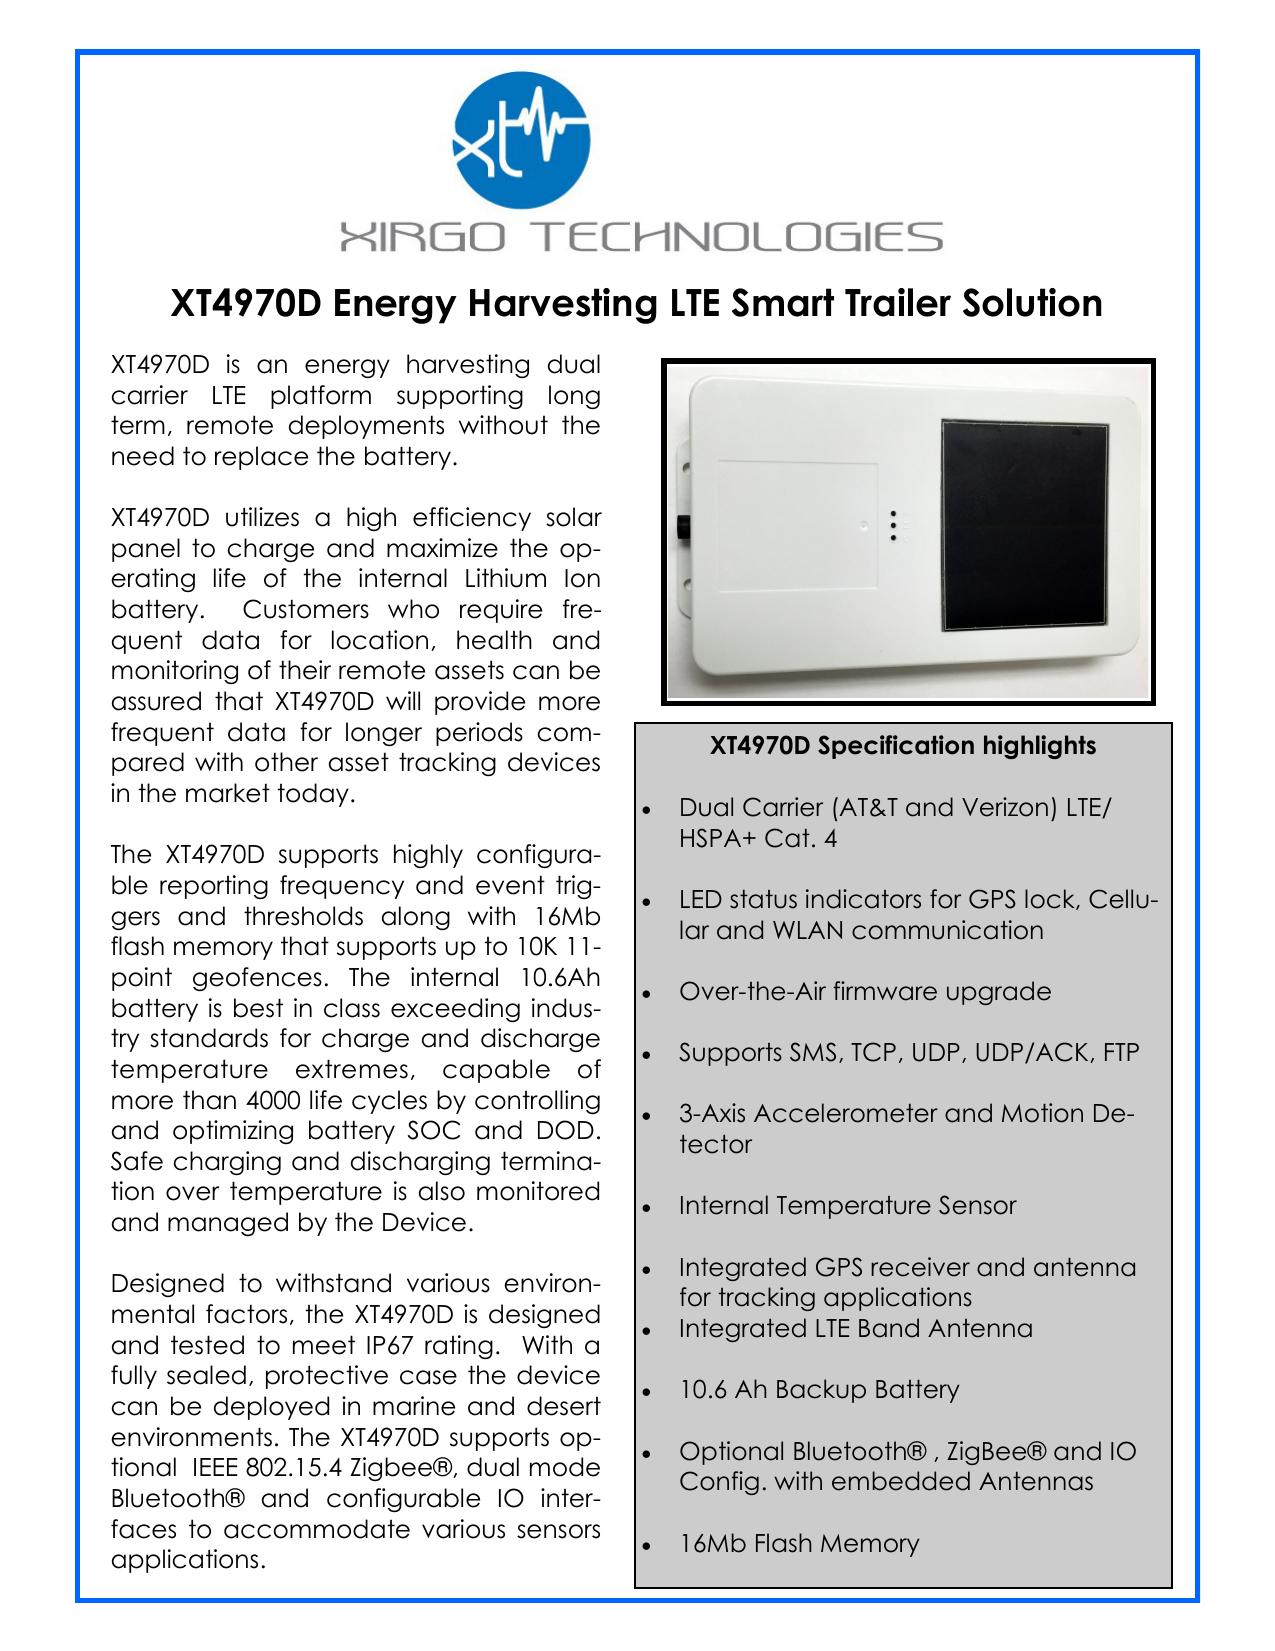 XT4970D Energy Harvesting LTE Smart Trailer Solution | manualzz com